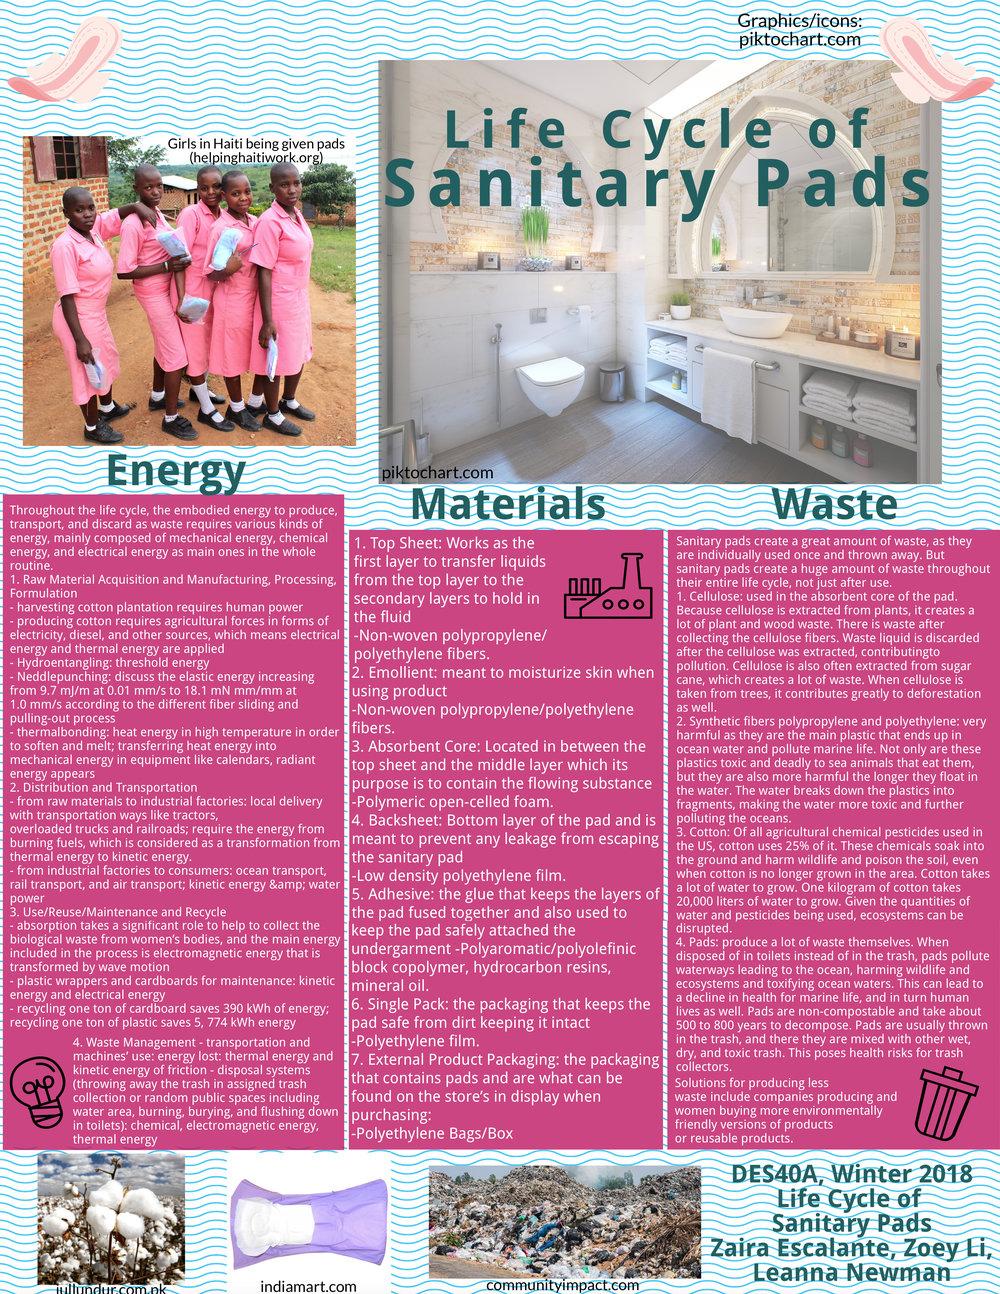 Sanitary Pads